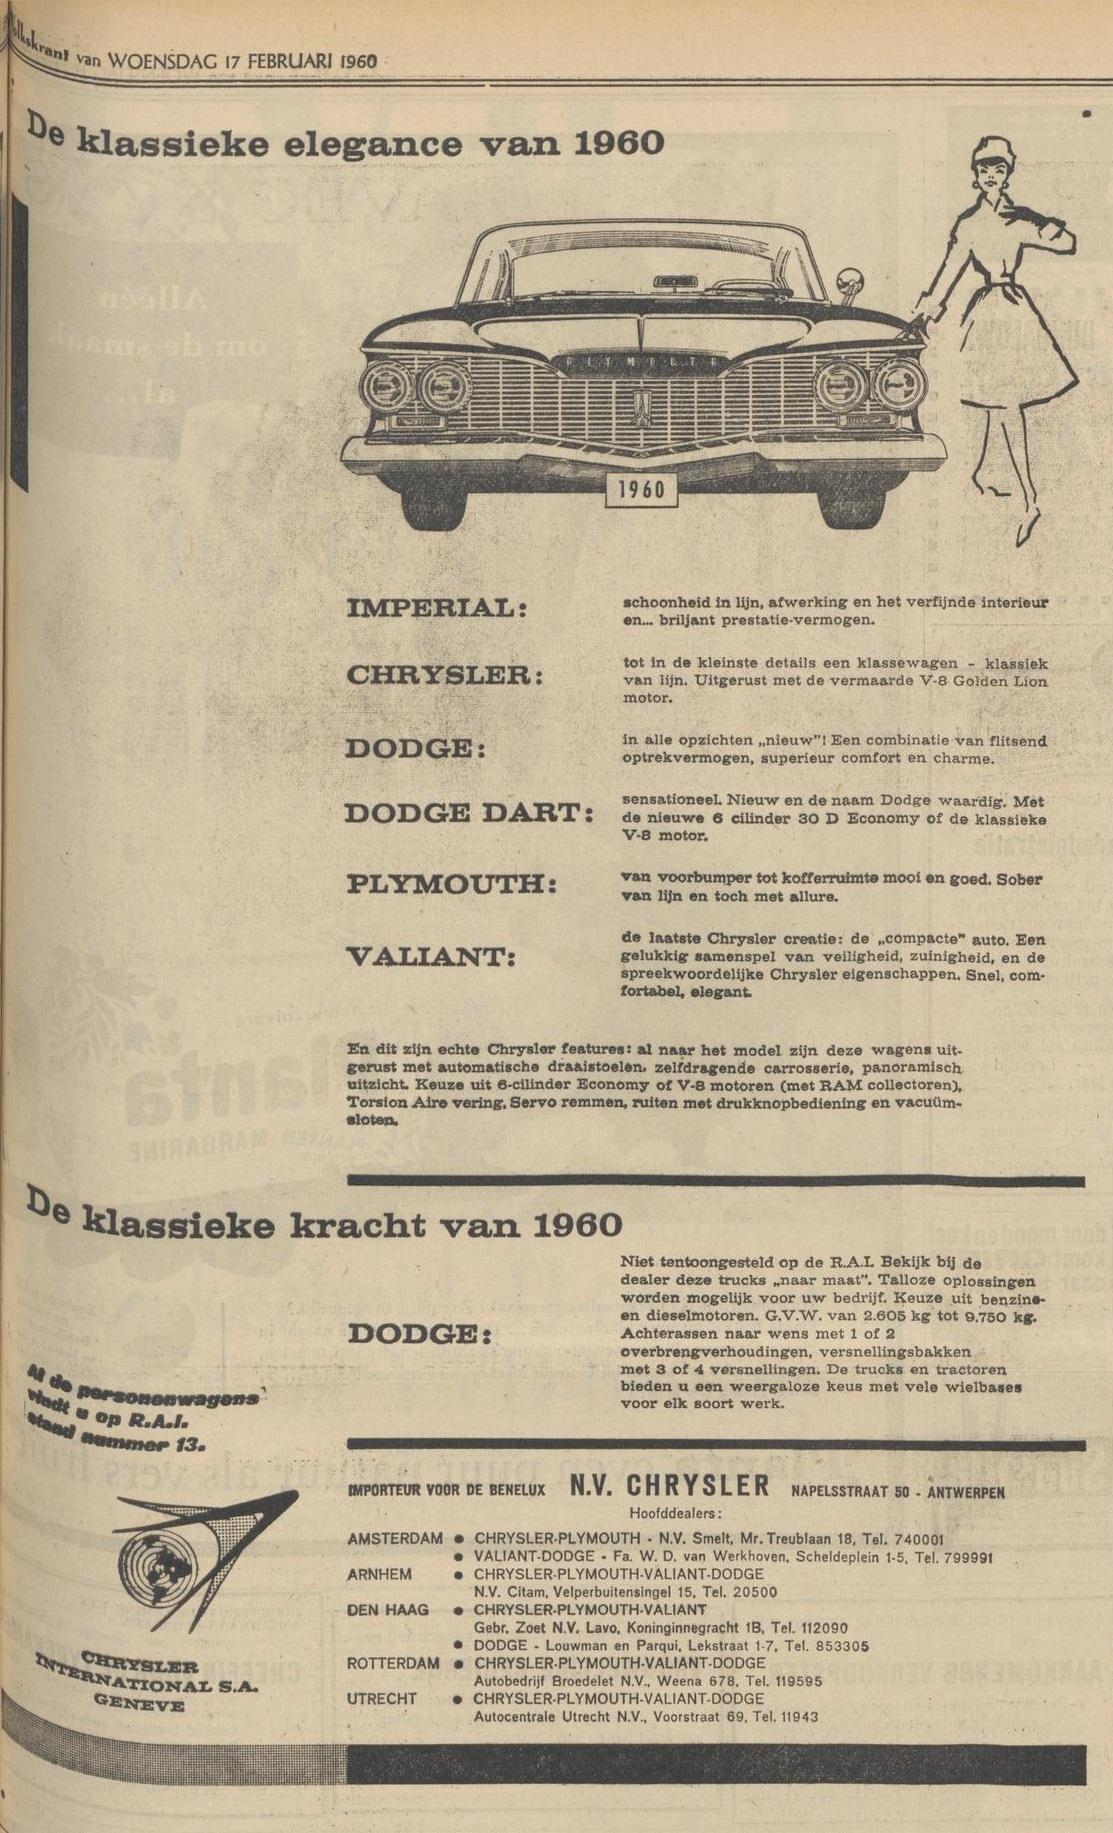 1960 volkskrant 17 feb